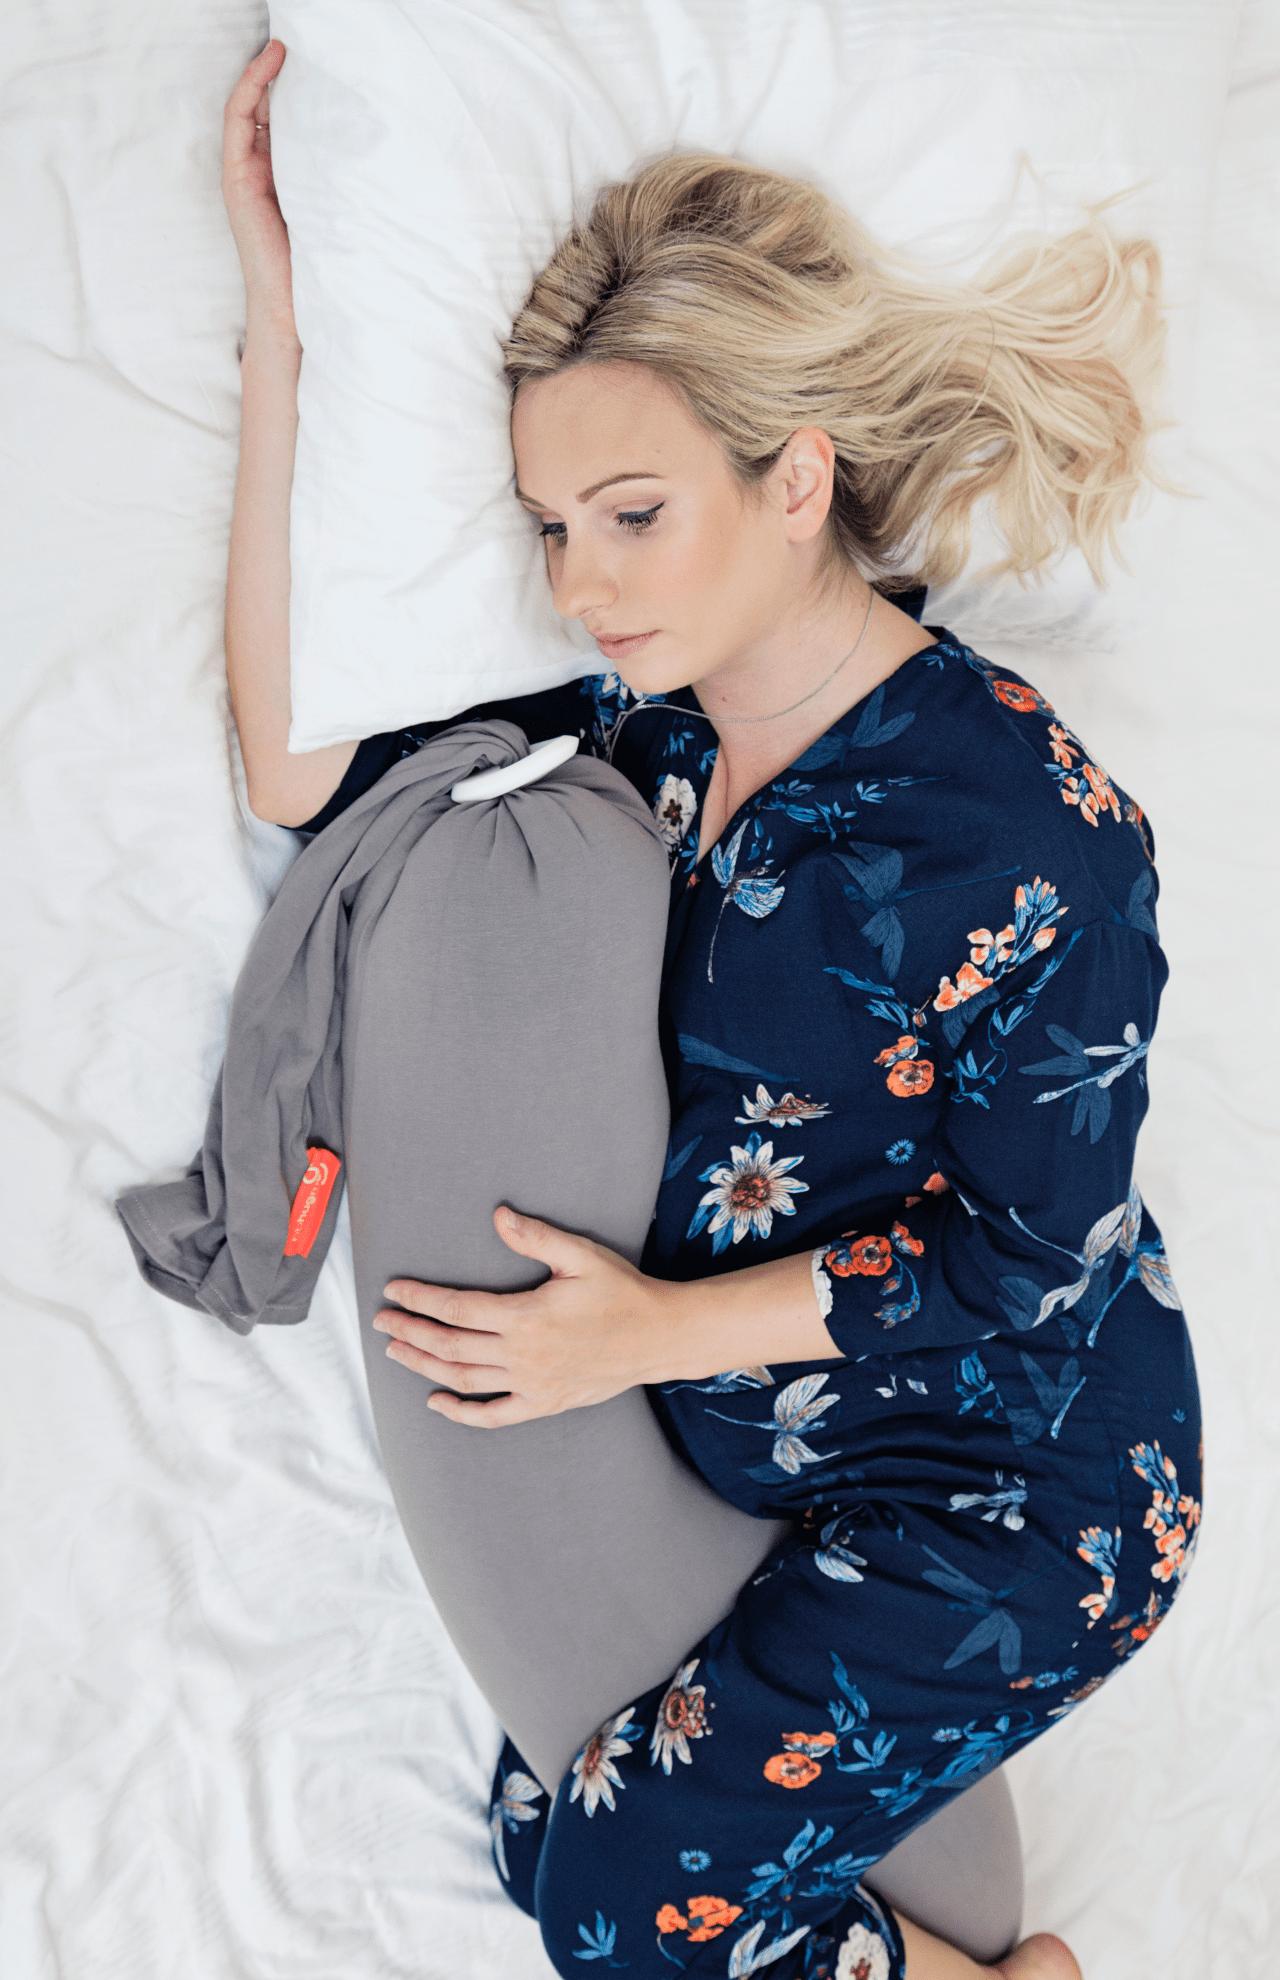 bbhugme Pregnancy Pillow GreyPlum